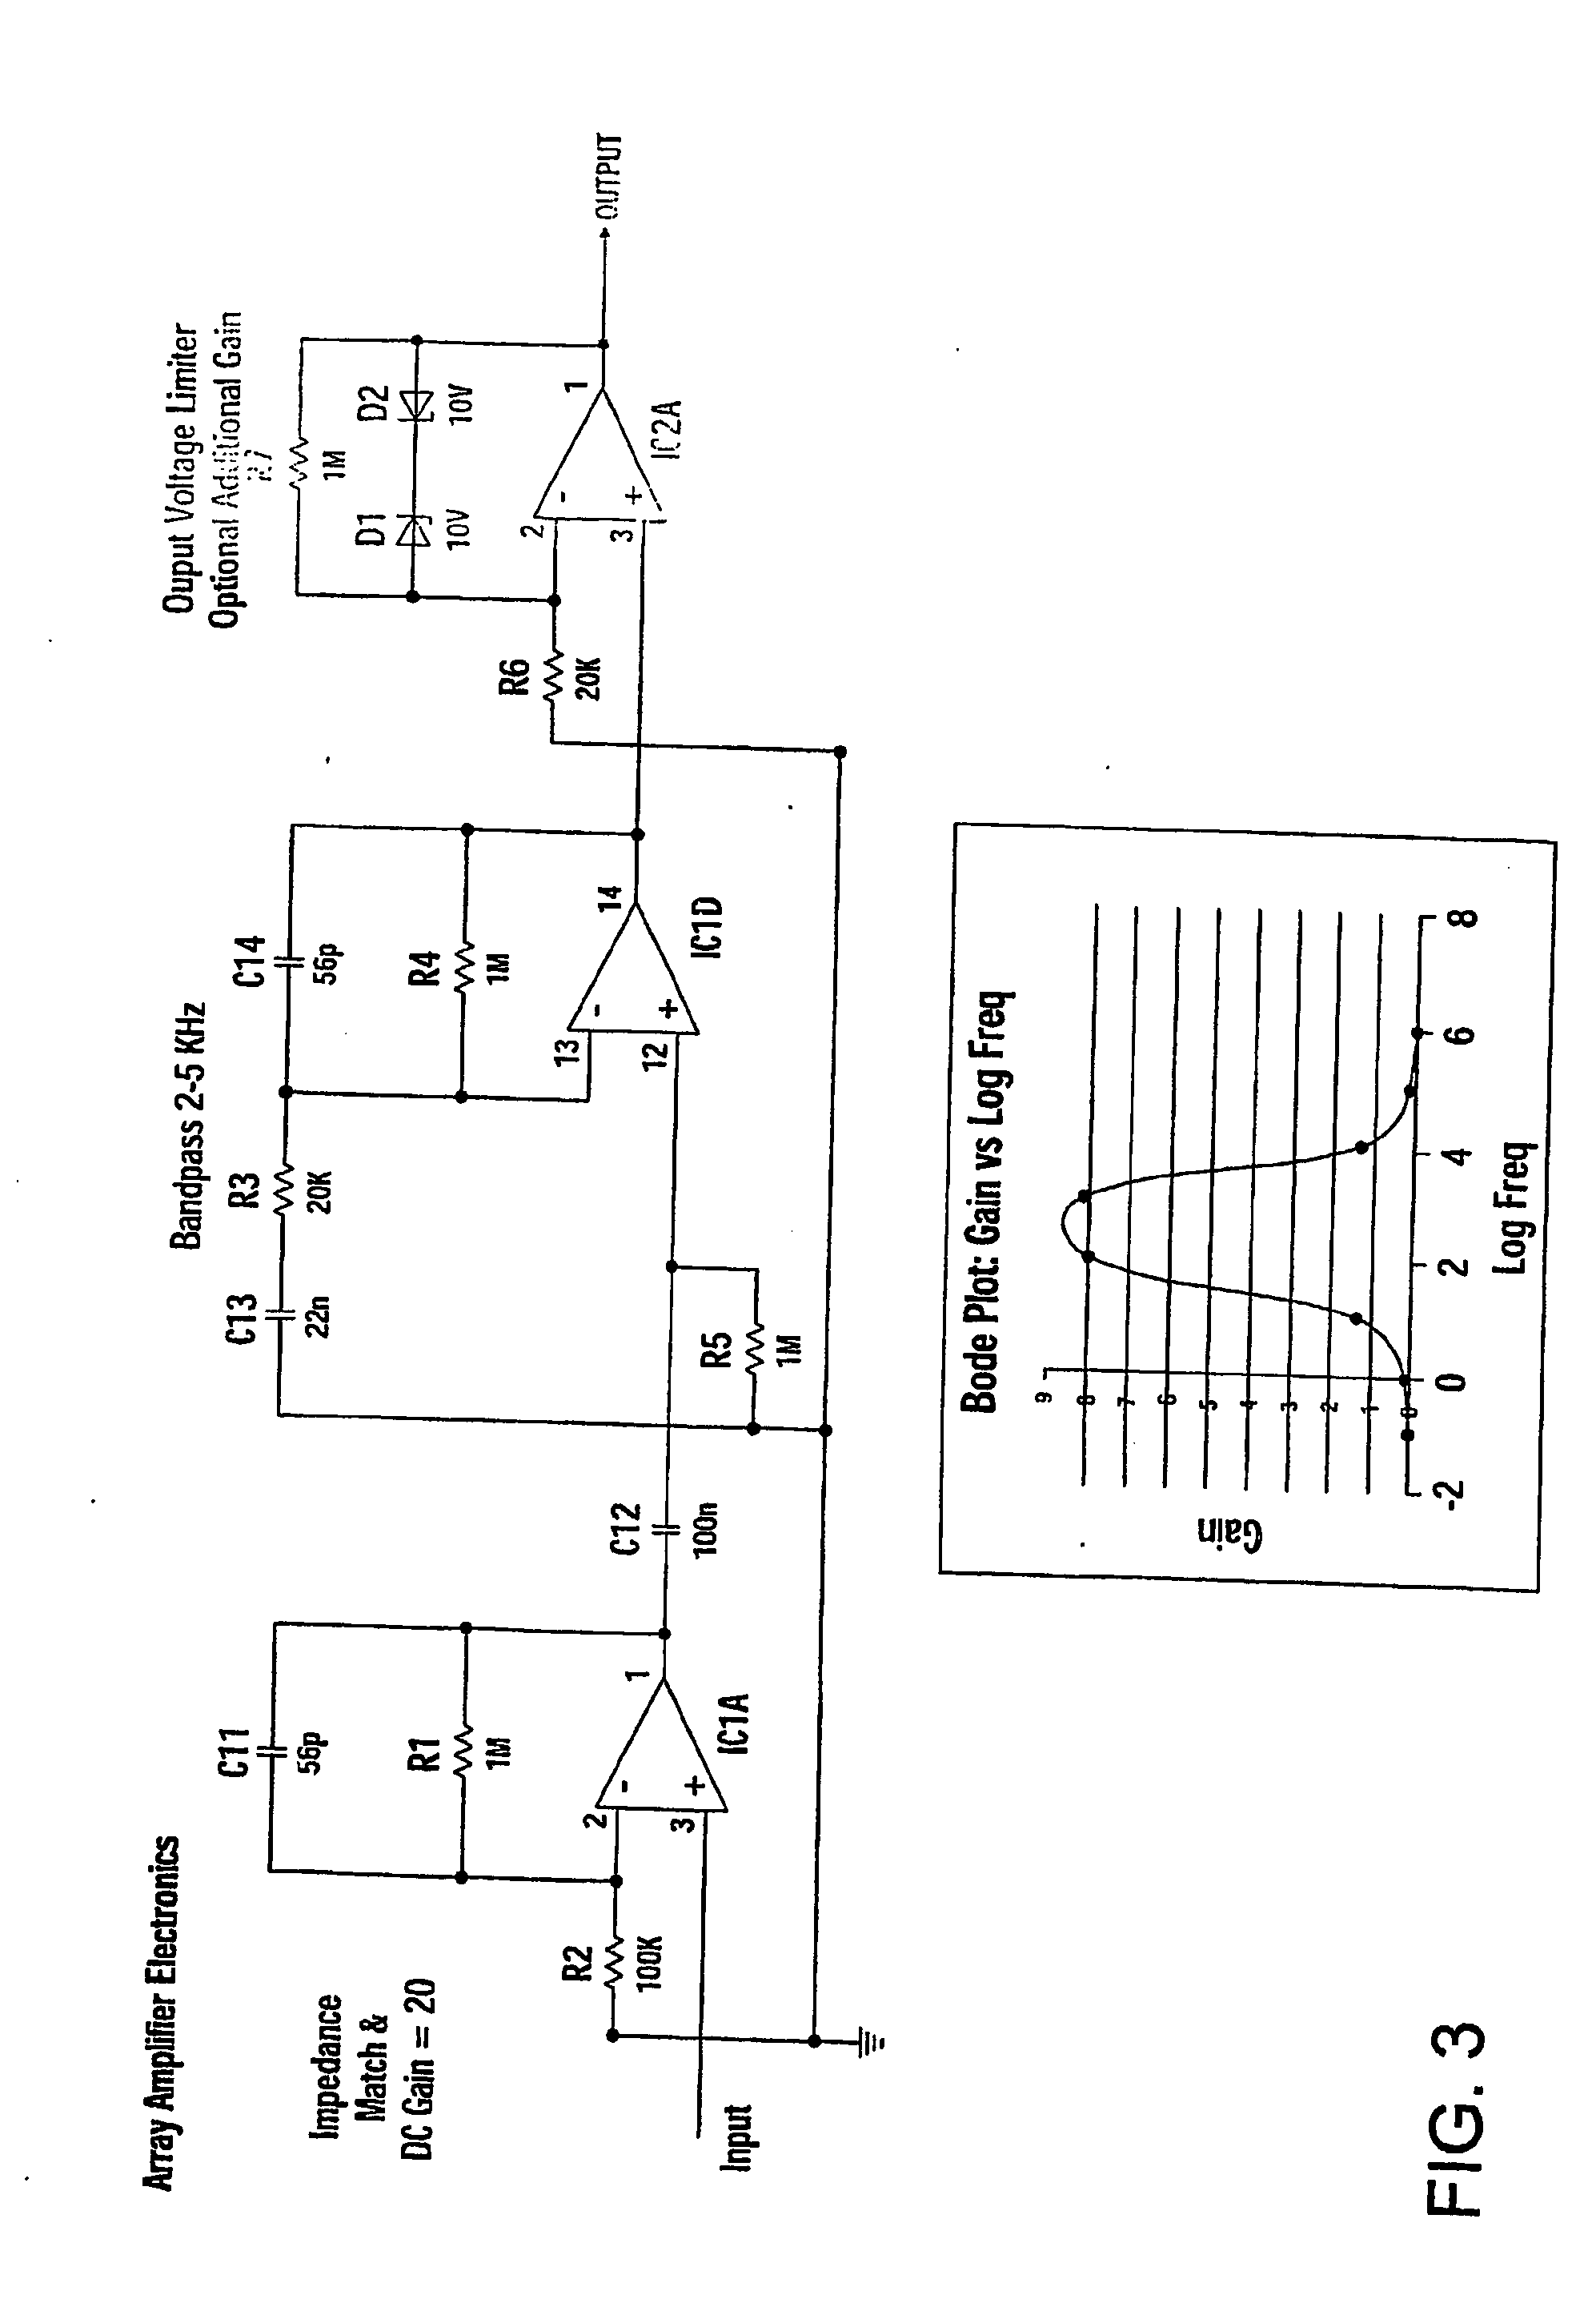 Wiring Diagram For A Cat 3406 Generator Com